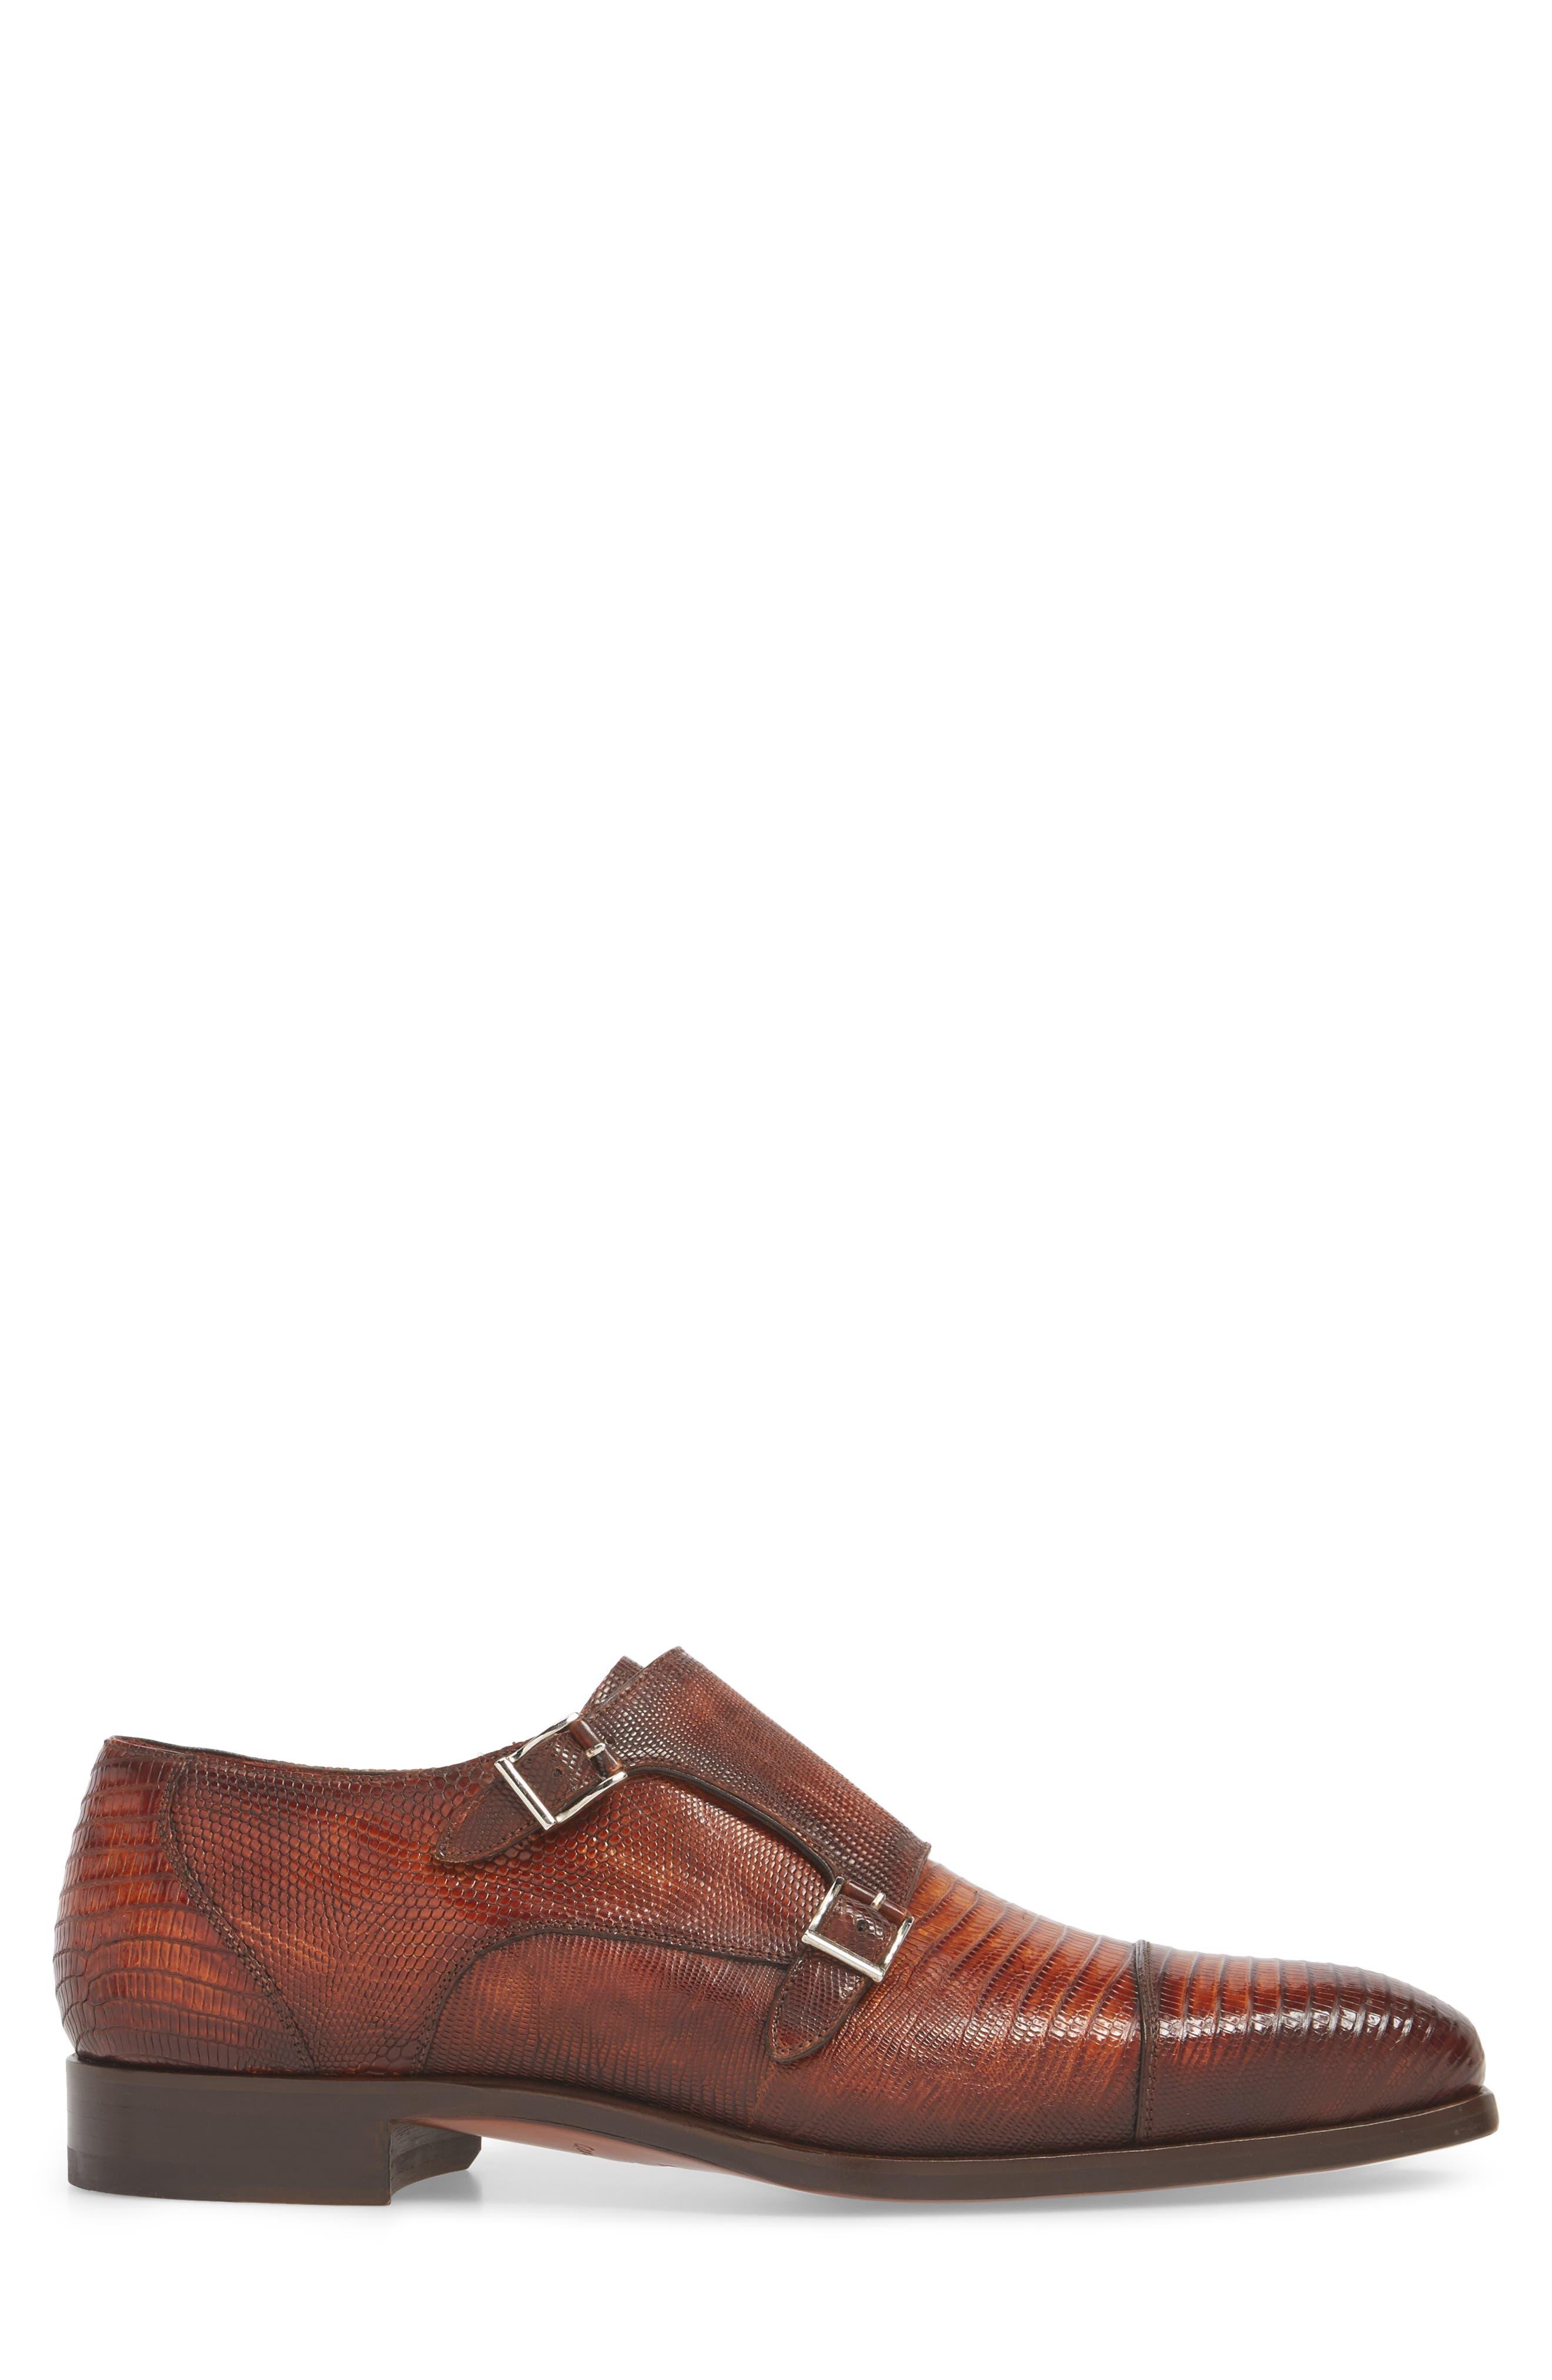 Isaac Cap Toe Monk Shoe,                             Alternate thumbnail 3, color,                             219